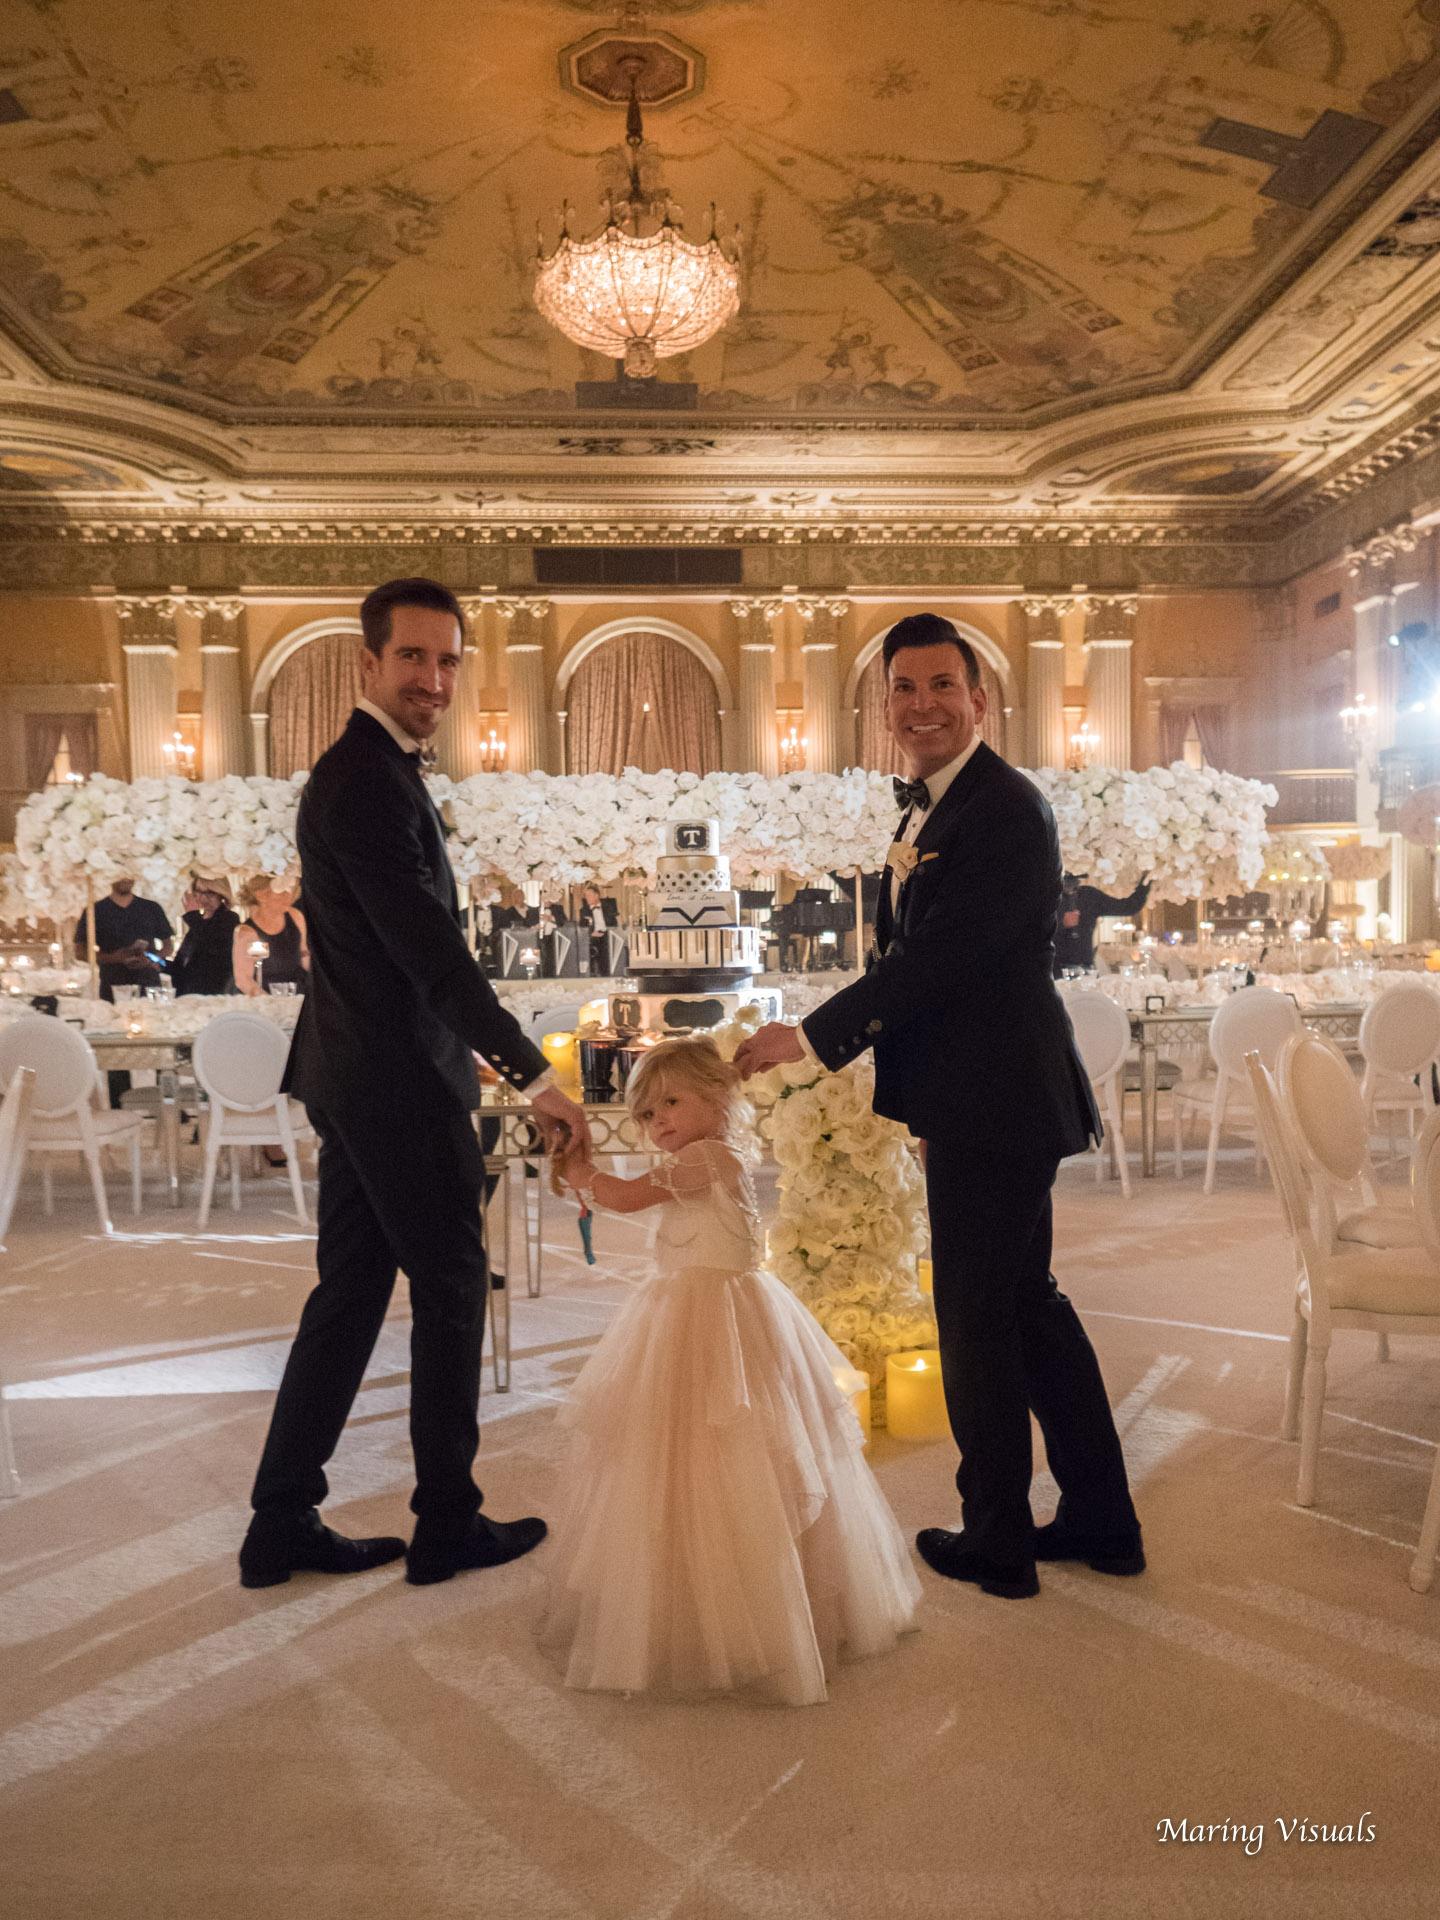 David Tutera Weddings by Maring Visuals 00540.jpg